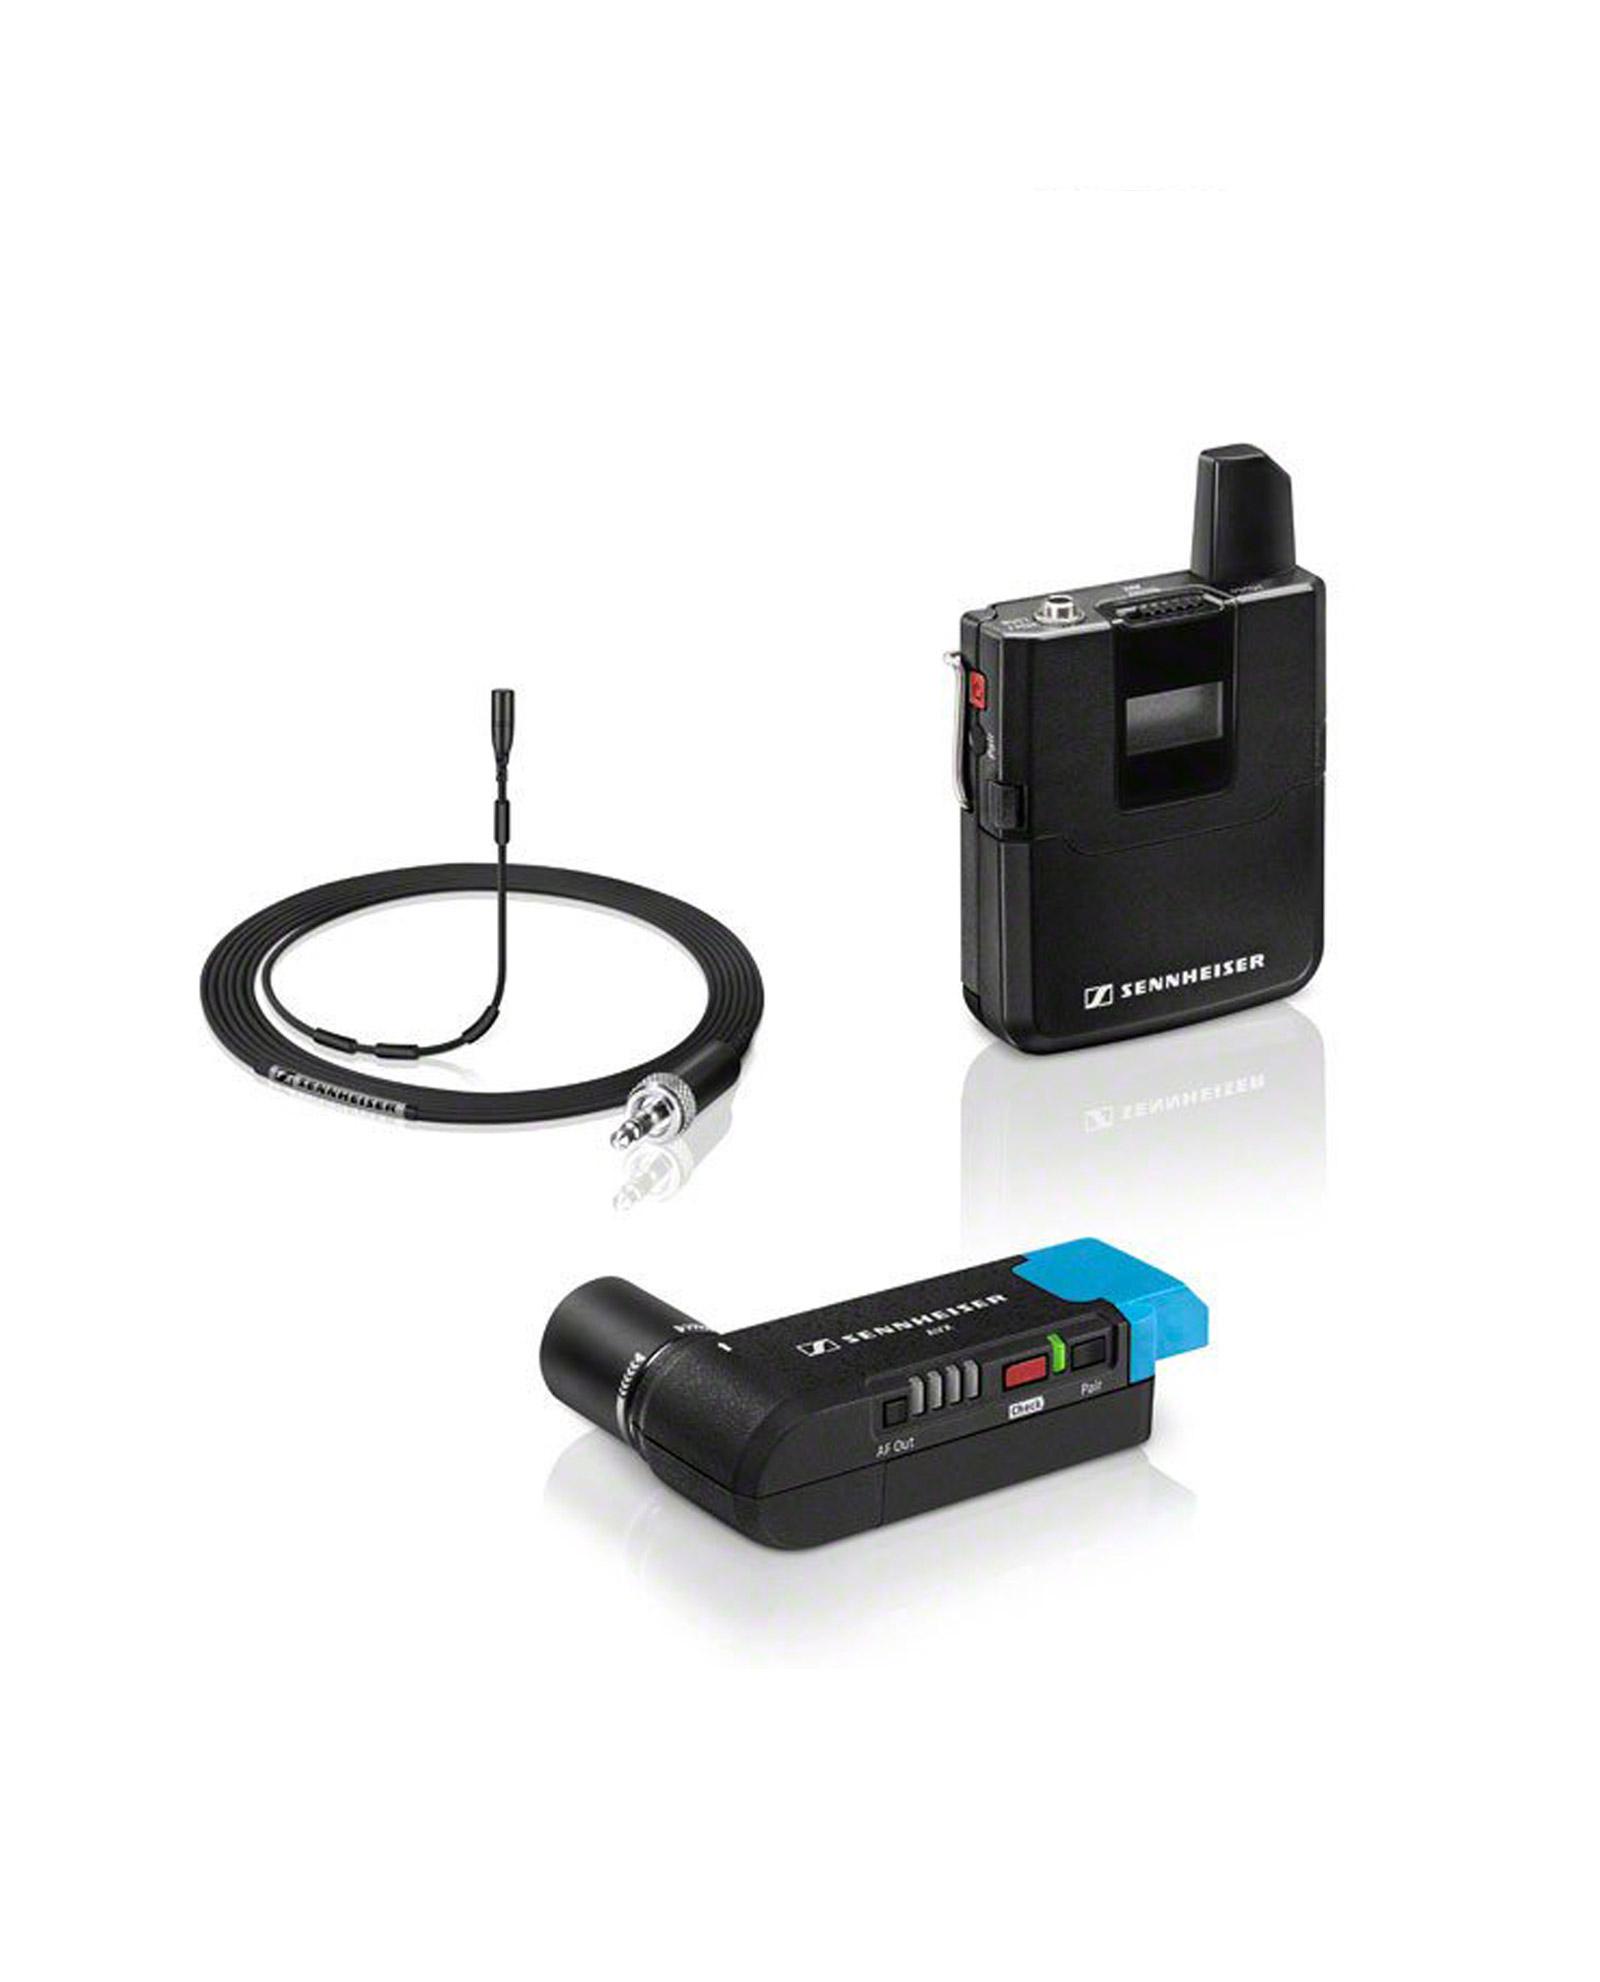 Sennheiser Avx Mke2 Wireless Digital compact Omni Lavalier Set 1